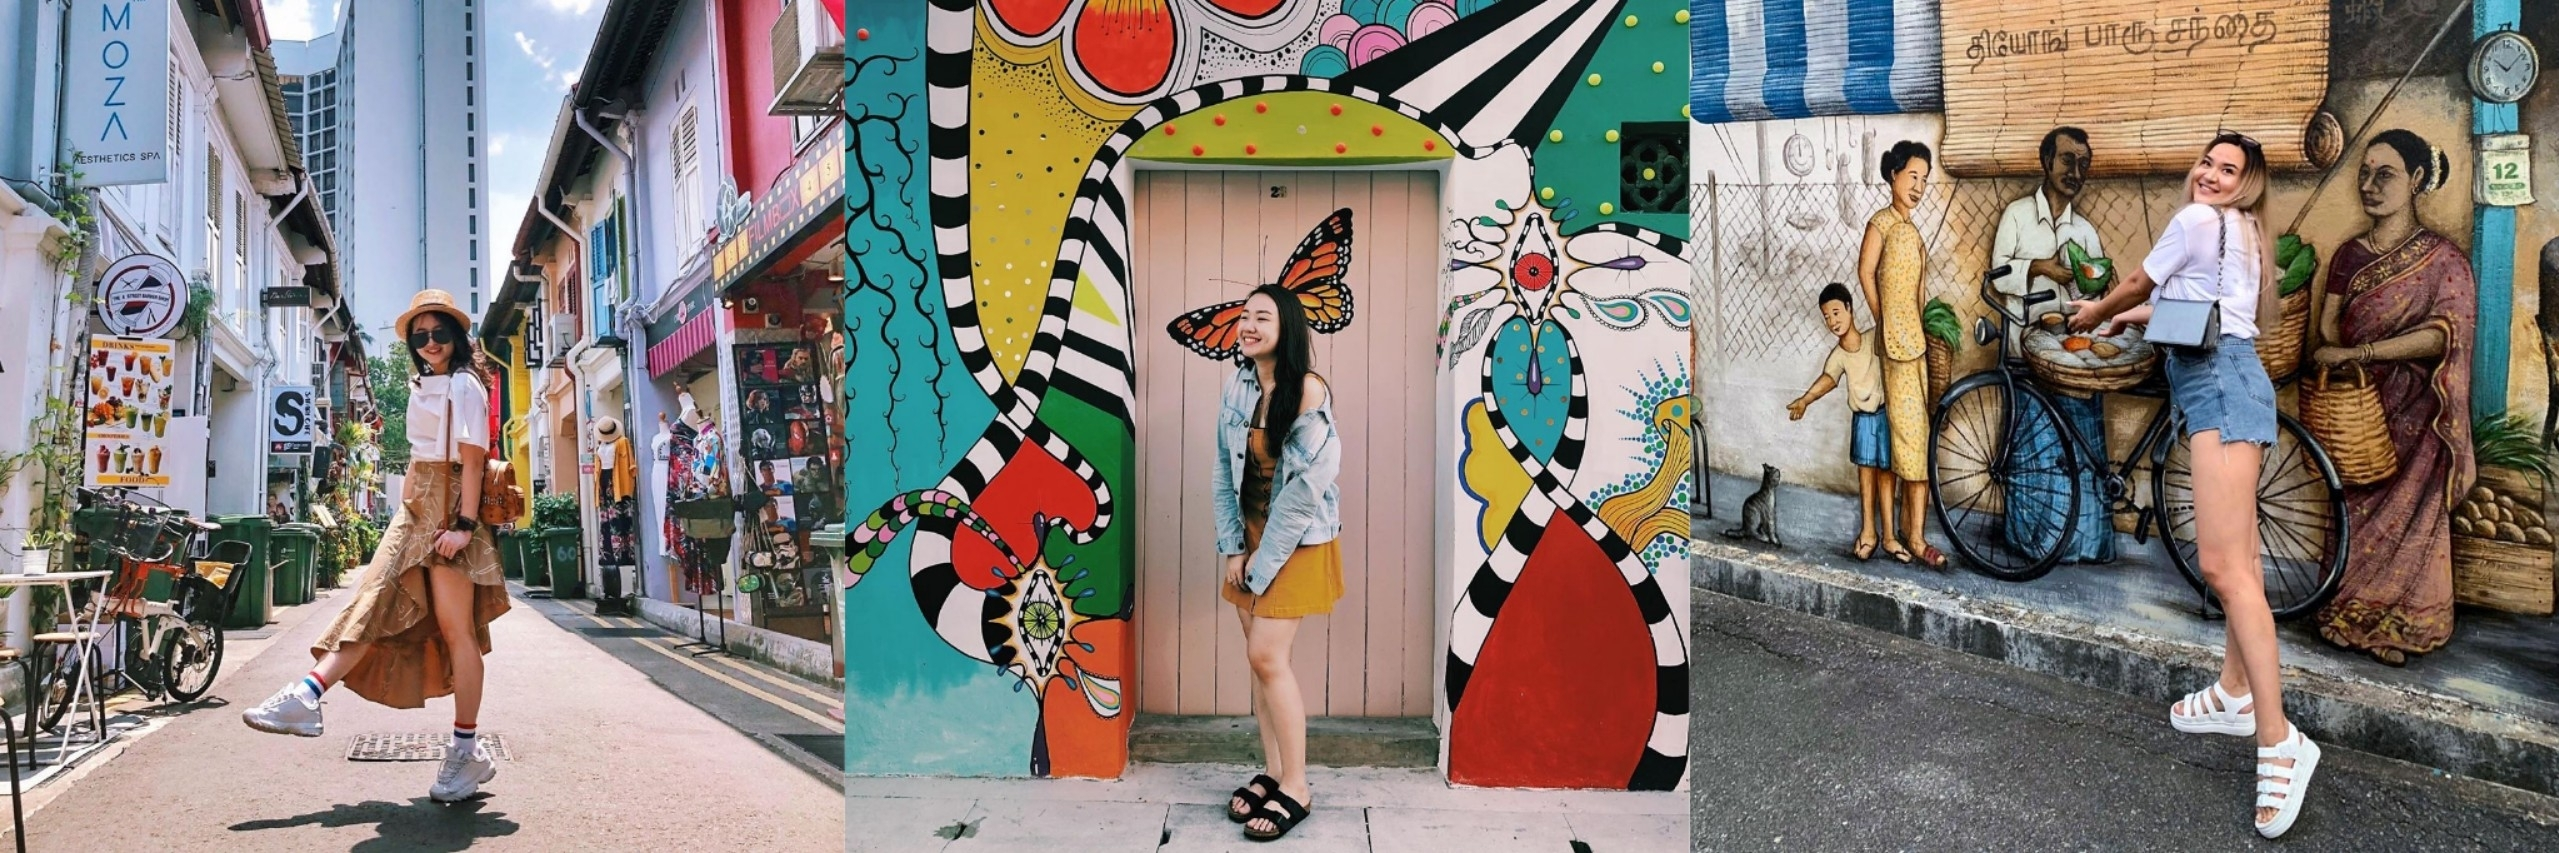 https://gody.vn/blog/n2203am/post/du-lich-singapore-top-10-dia-diem-check-in-mien-phi-cho-dan-song-ao-chay-may-4422